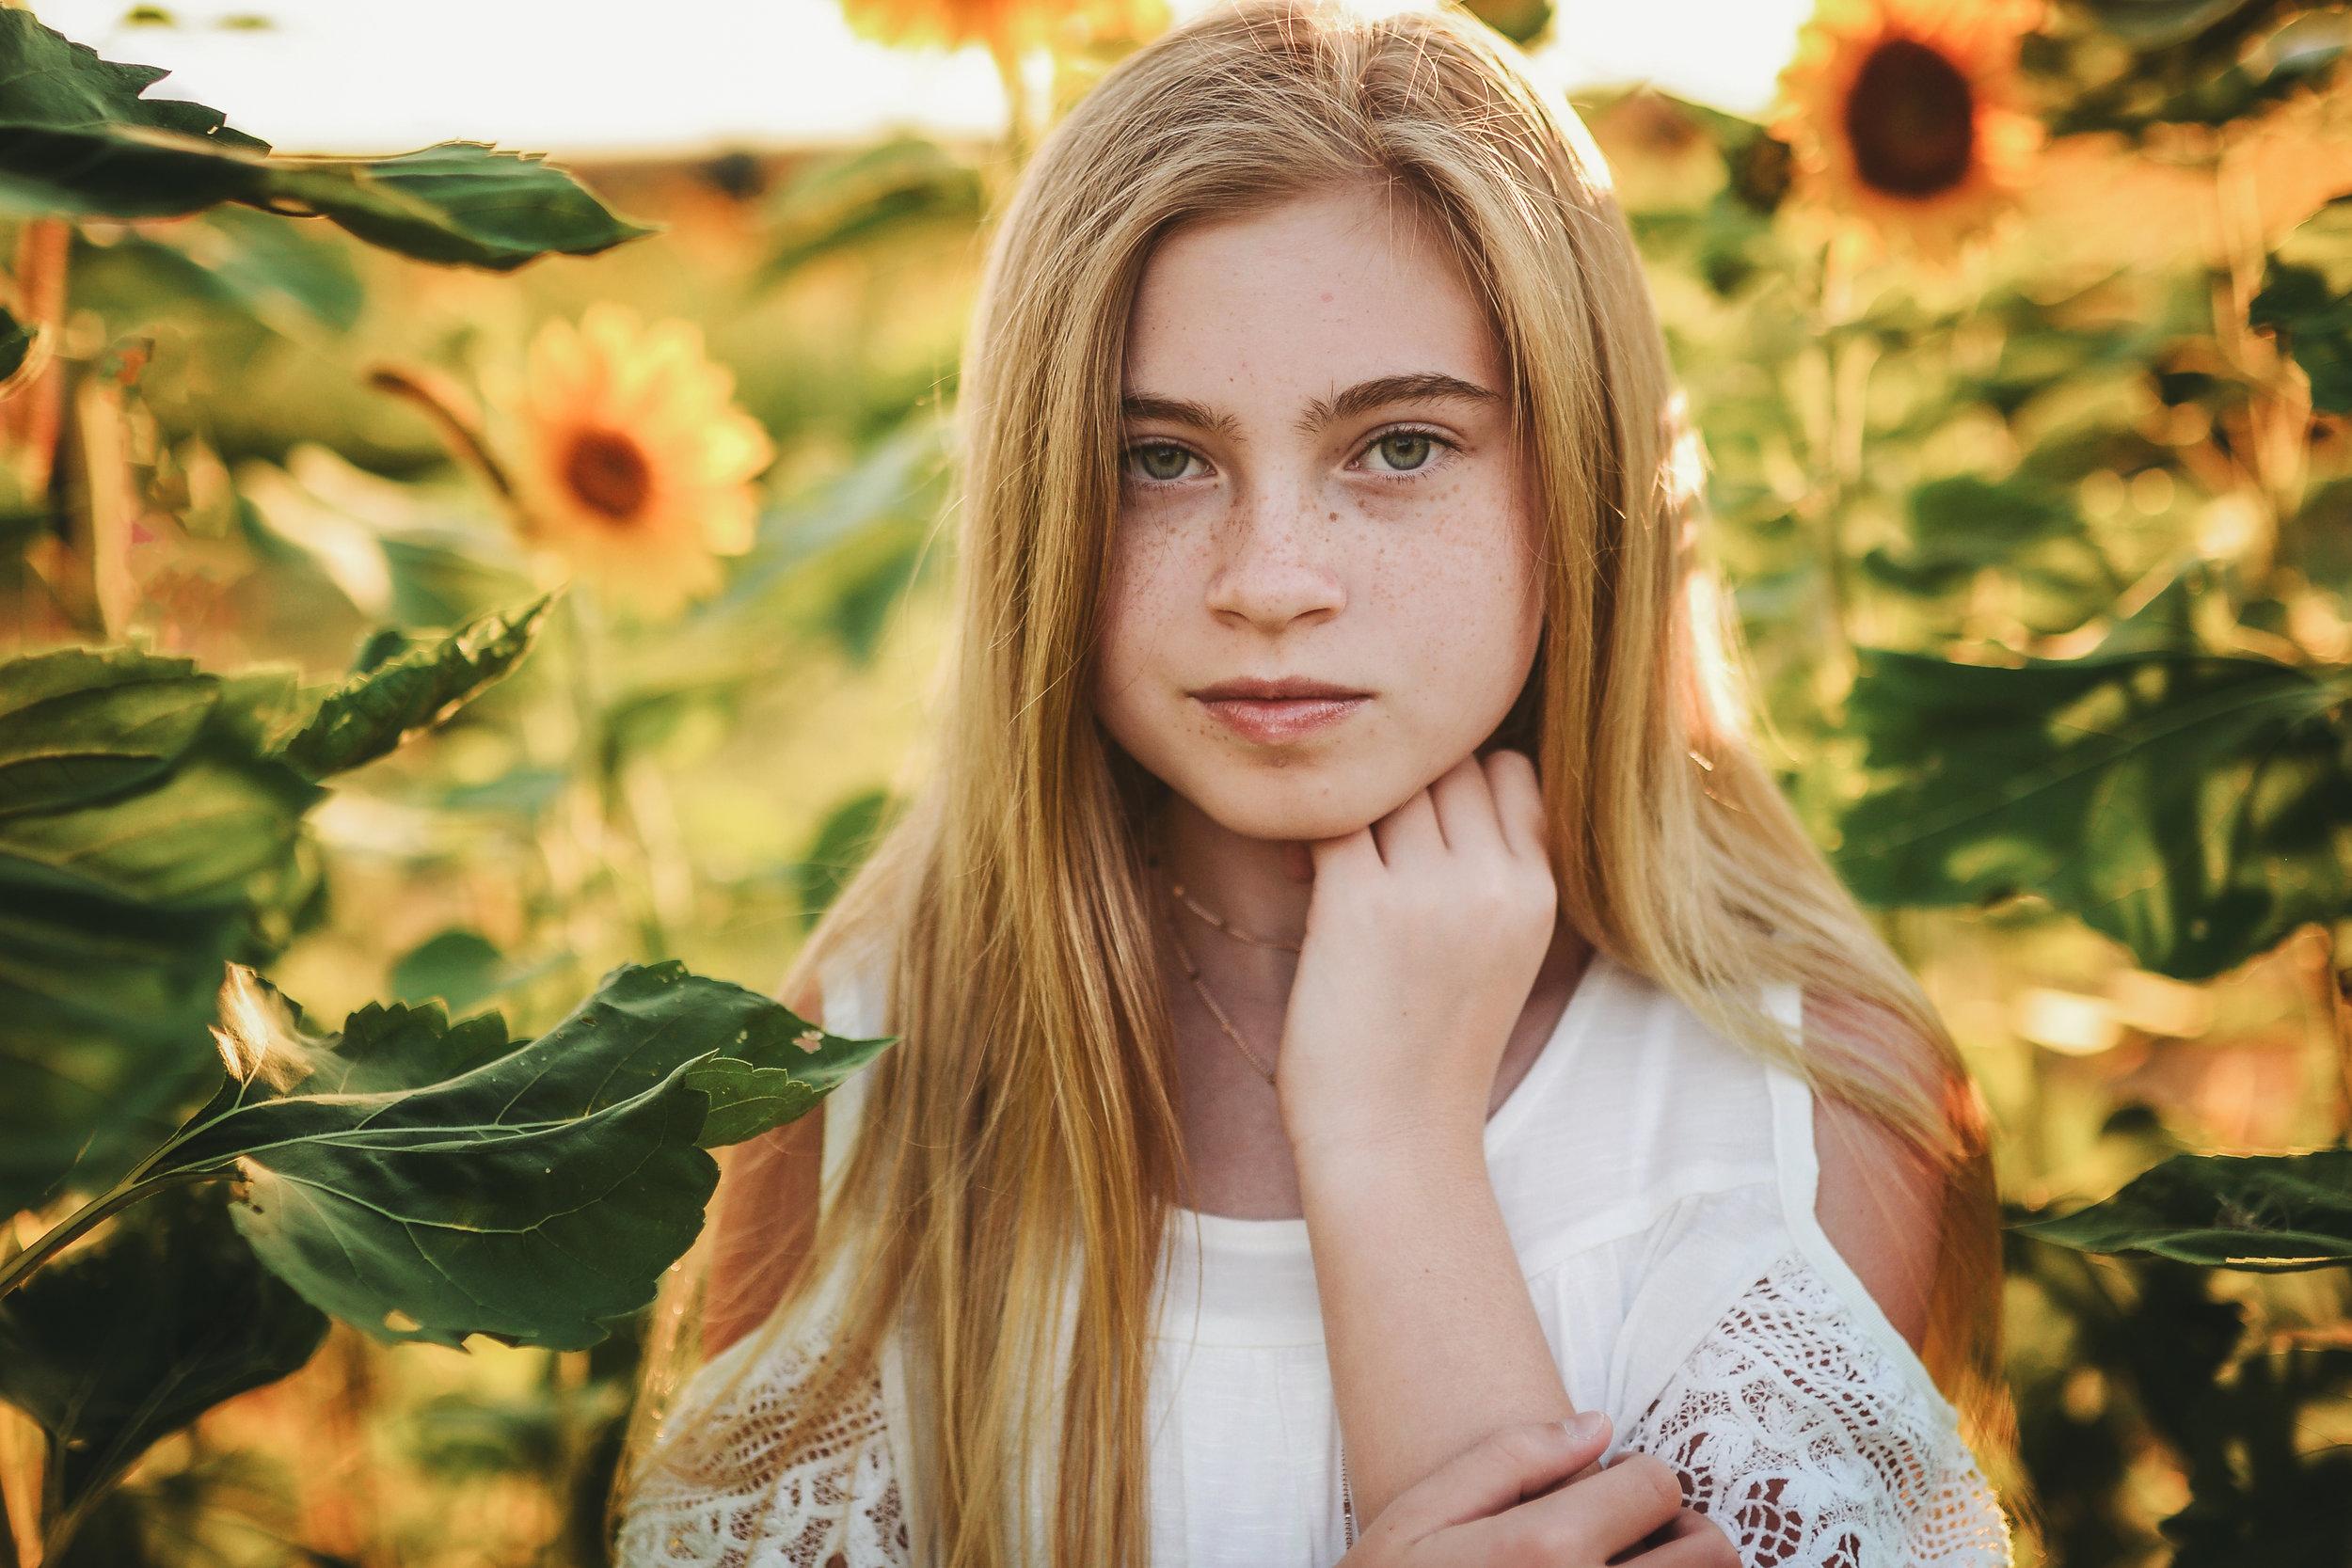 KSP_2018_SunflowerMini_Crutcher01.jpg